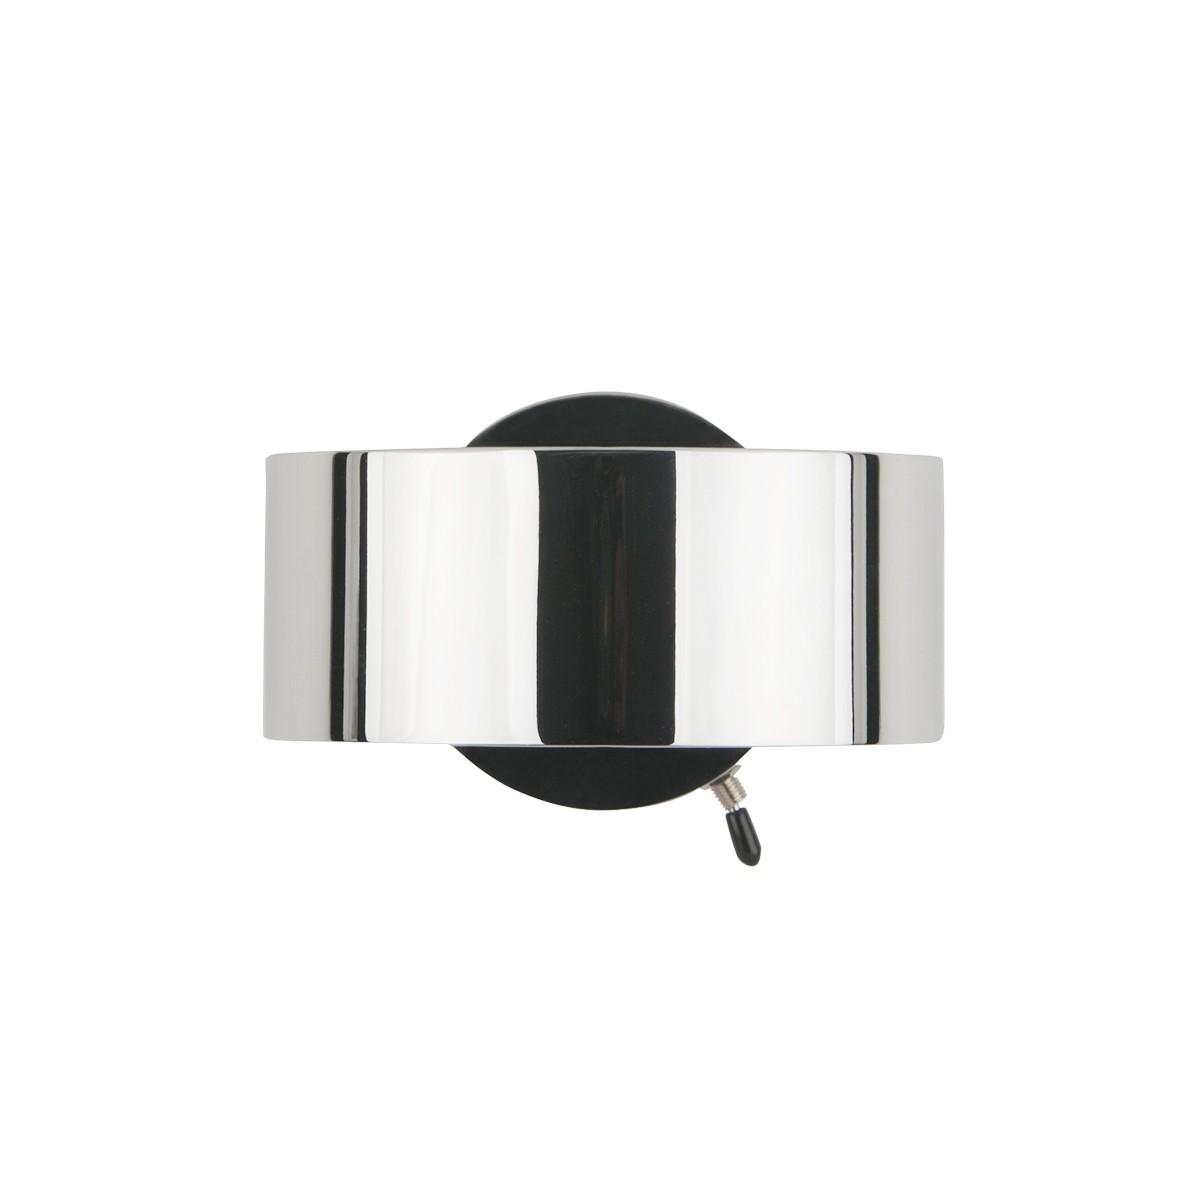 Top Light Puk Maxx Wall + Wandleuchte, mit Schaltereinbau, Chrom